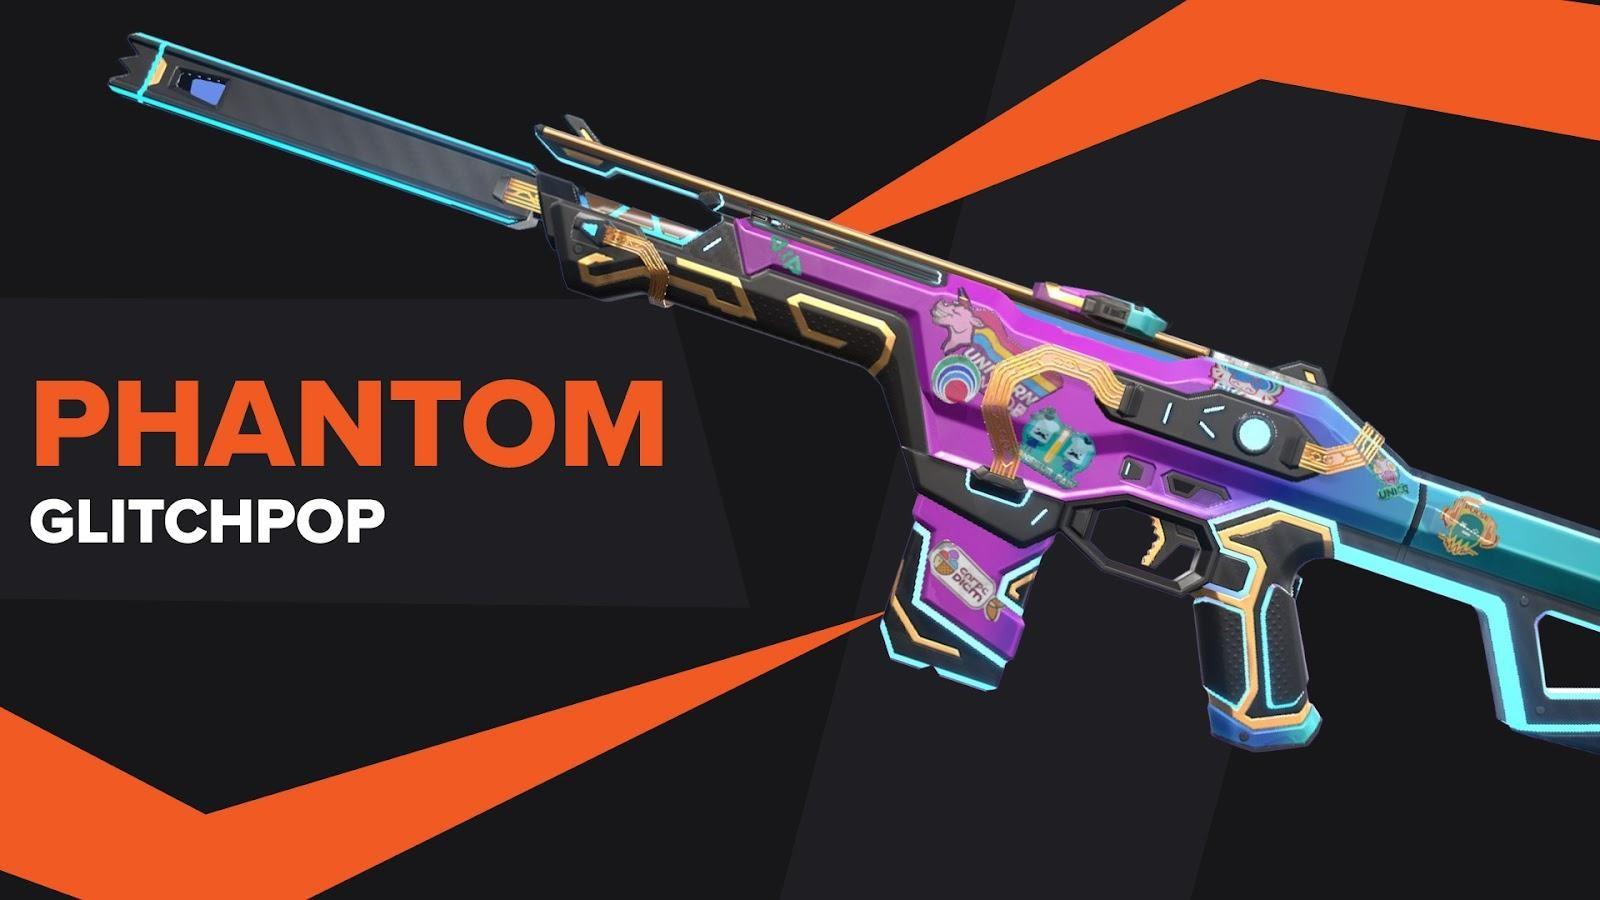 Phantom Glitchpop Skin